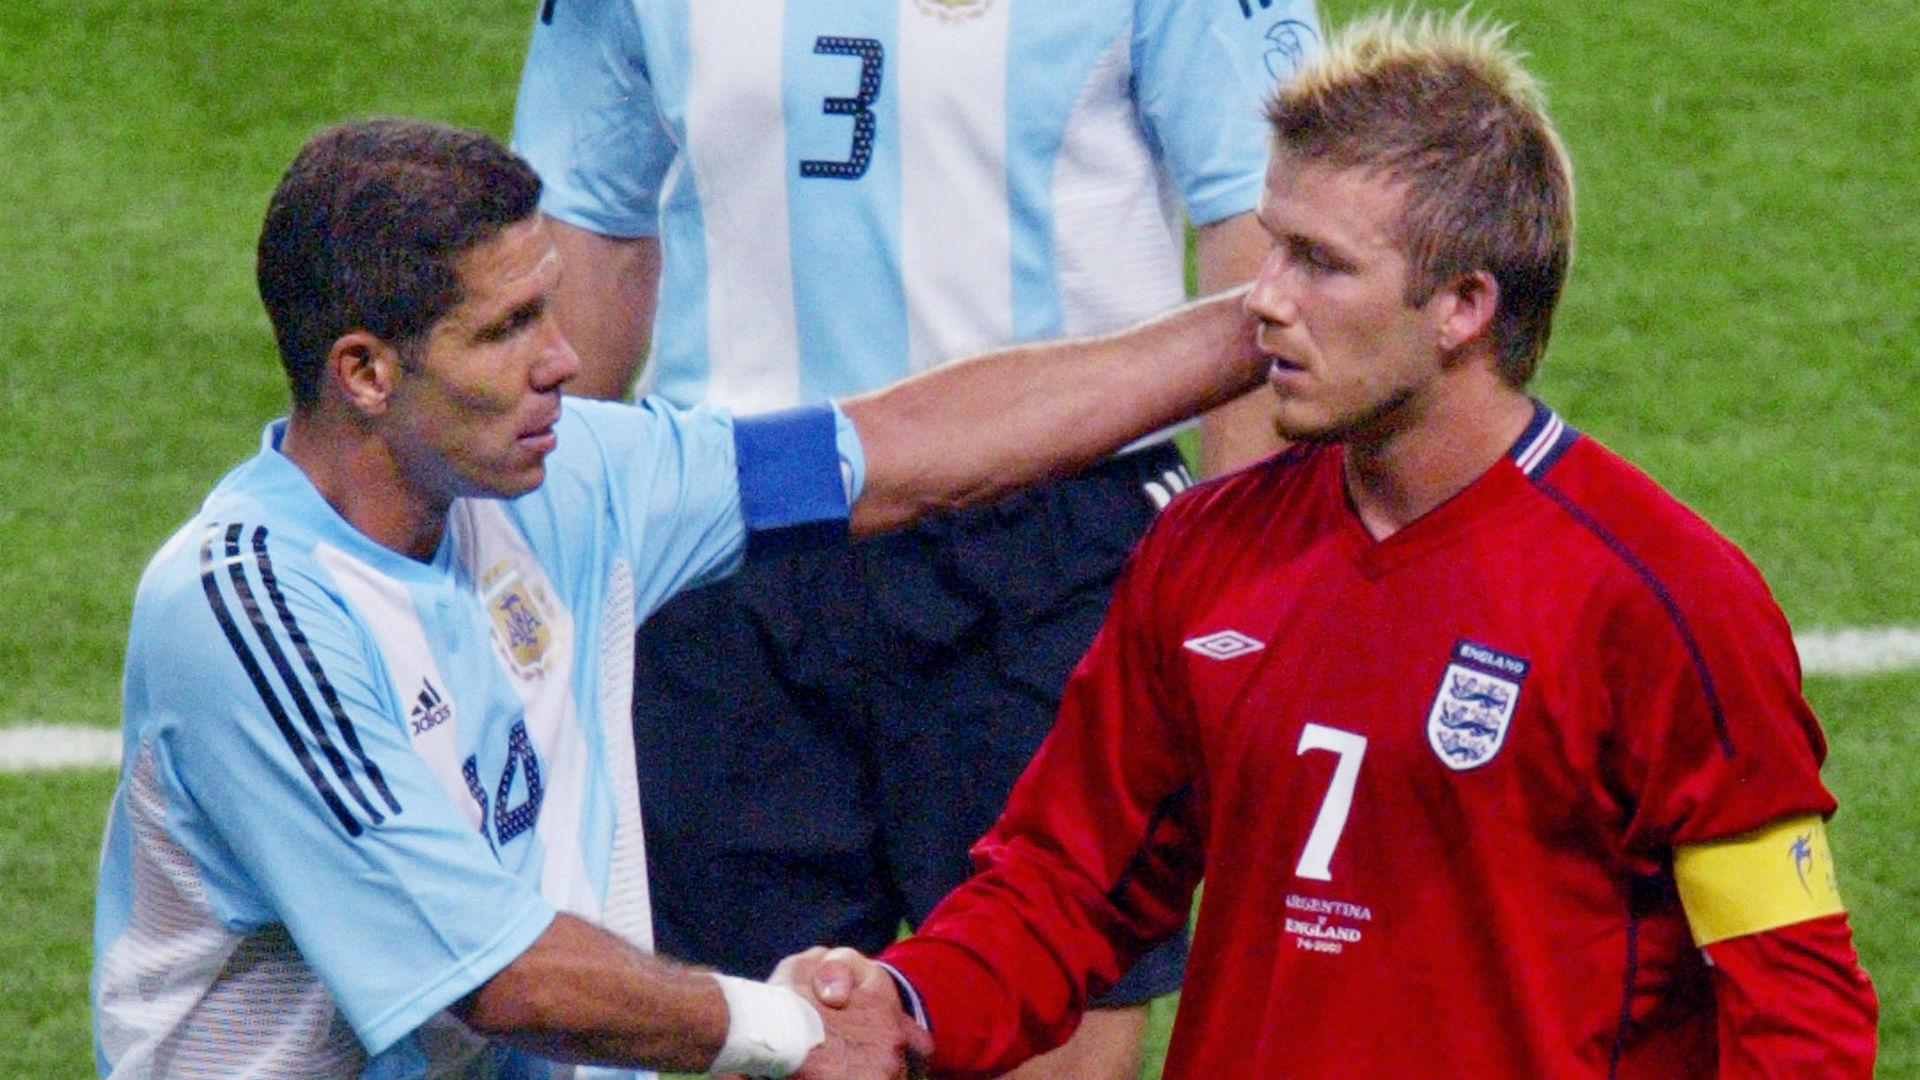 Diego Simeone Argentina David Beckham England World Cup 2002